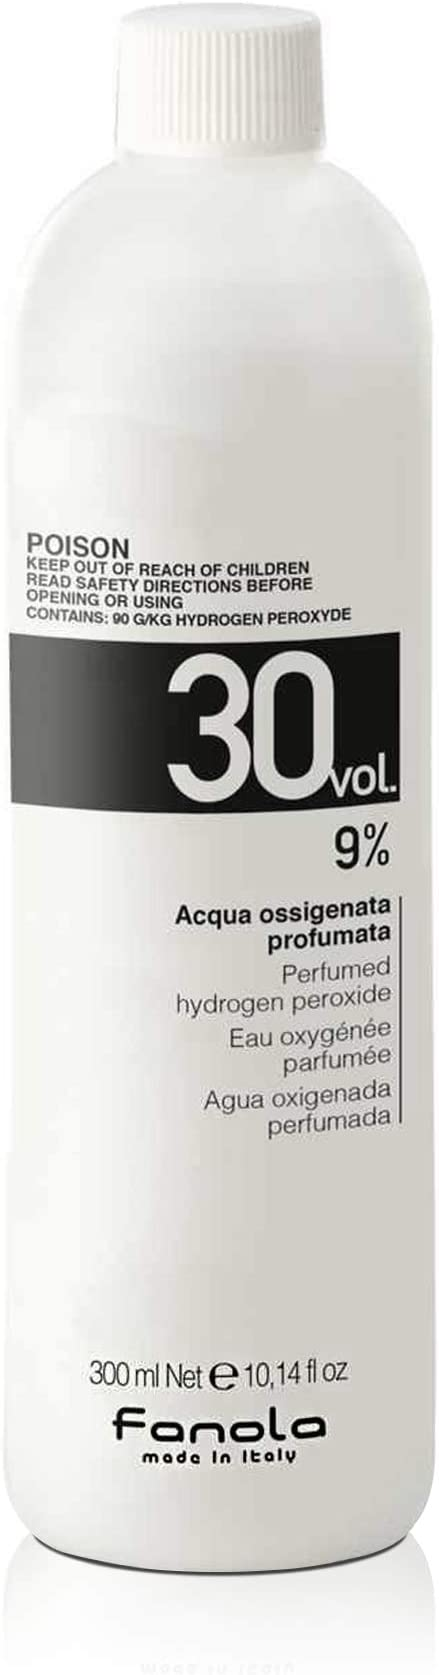 Fanola - Peróxido 9 %, 300 ml